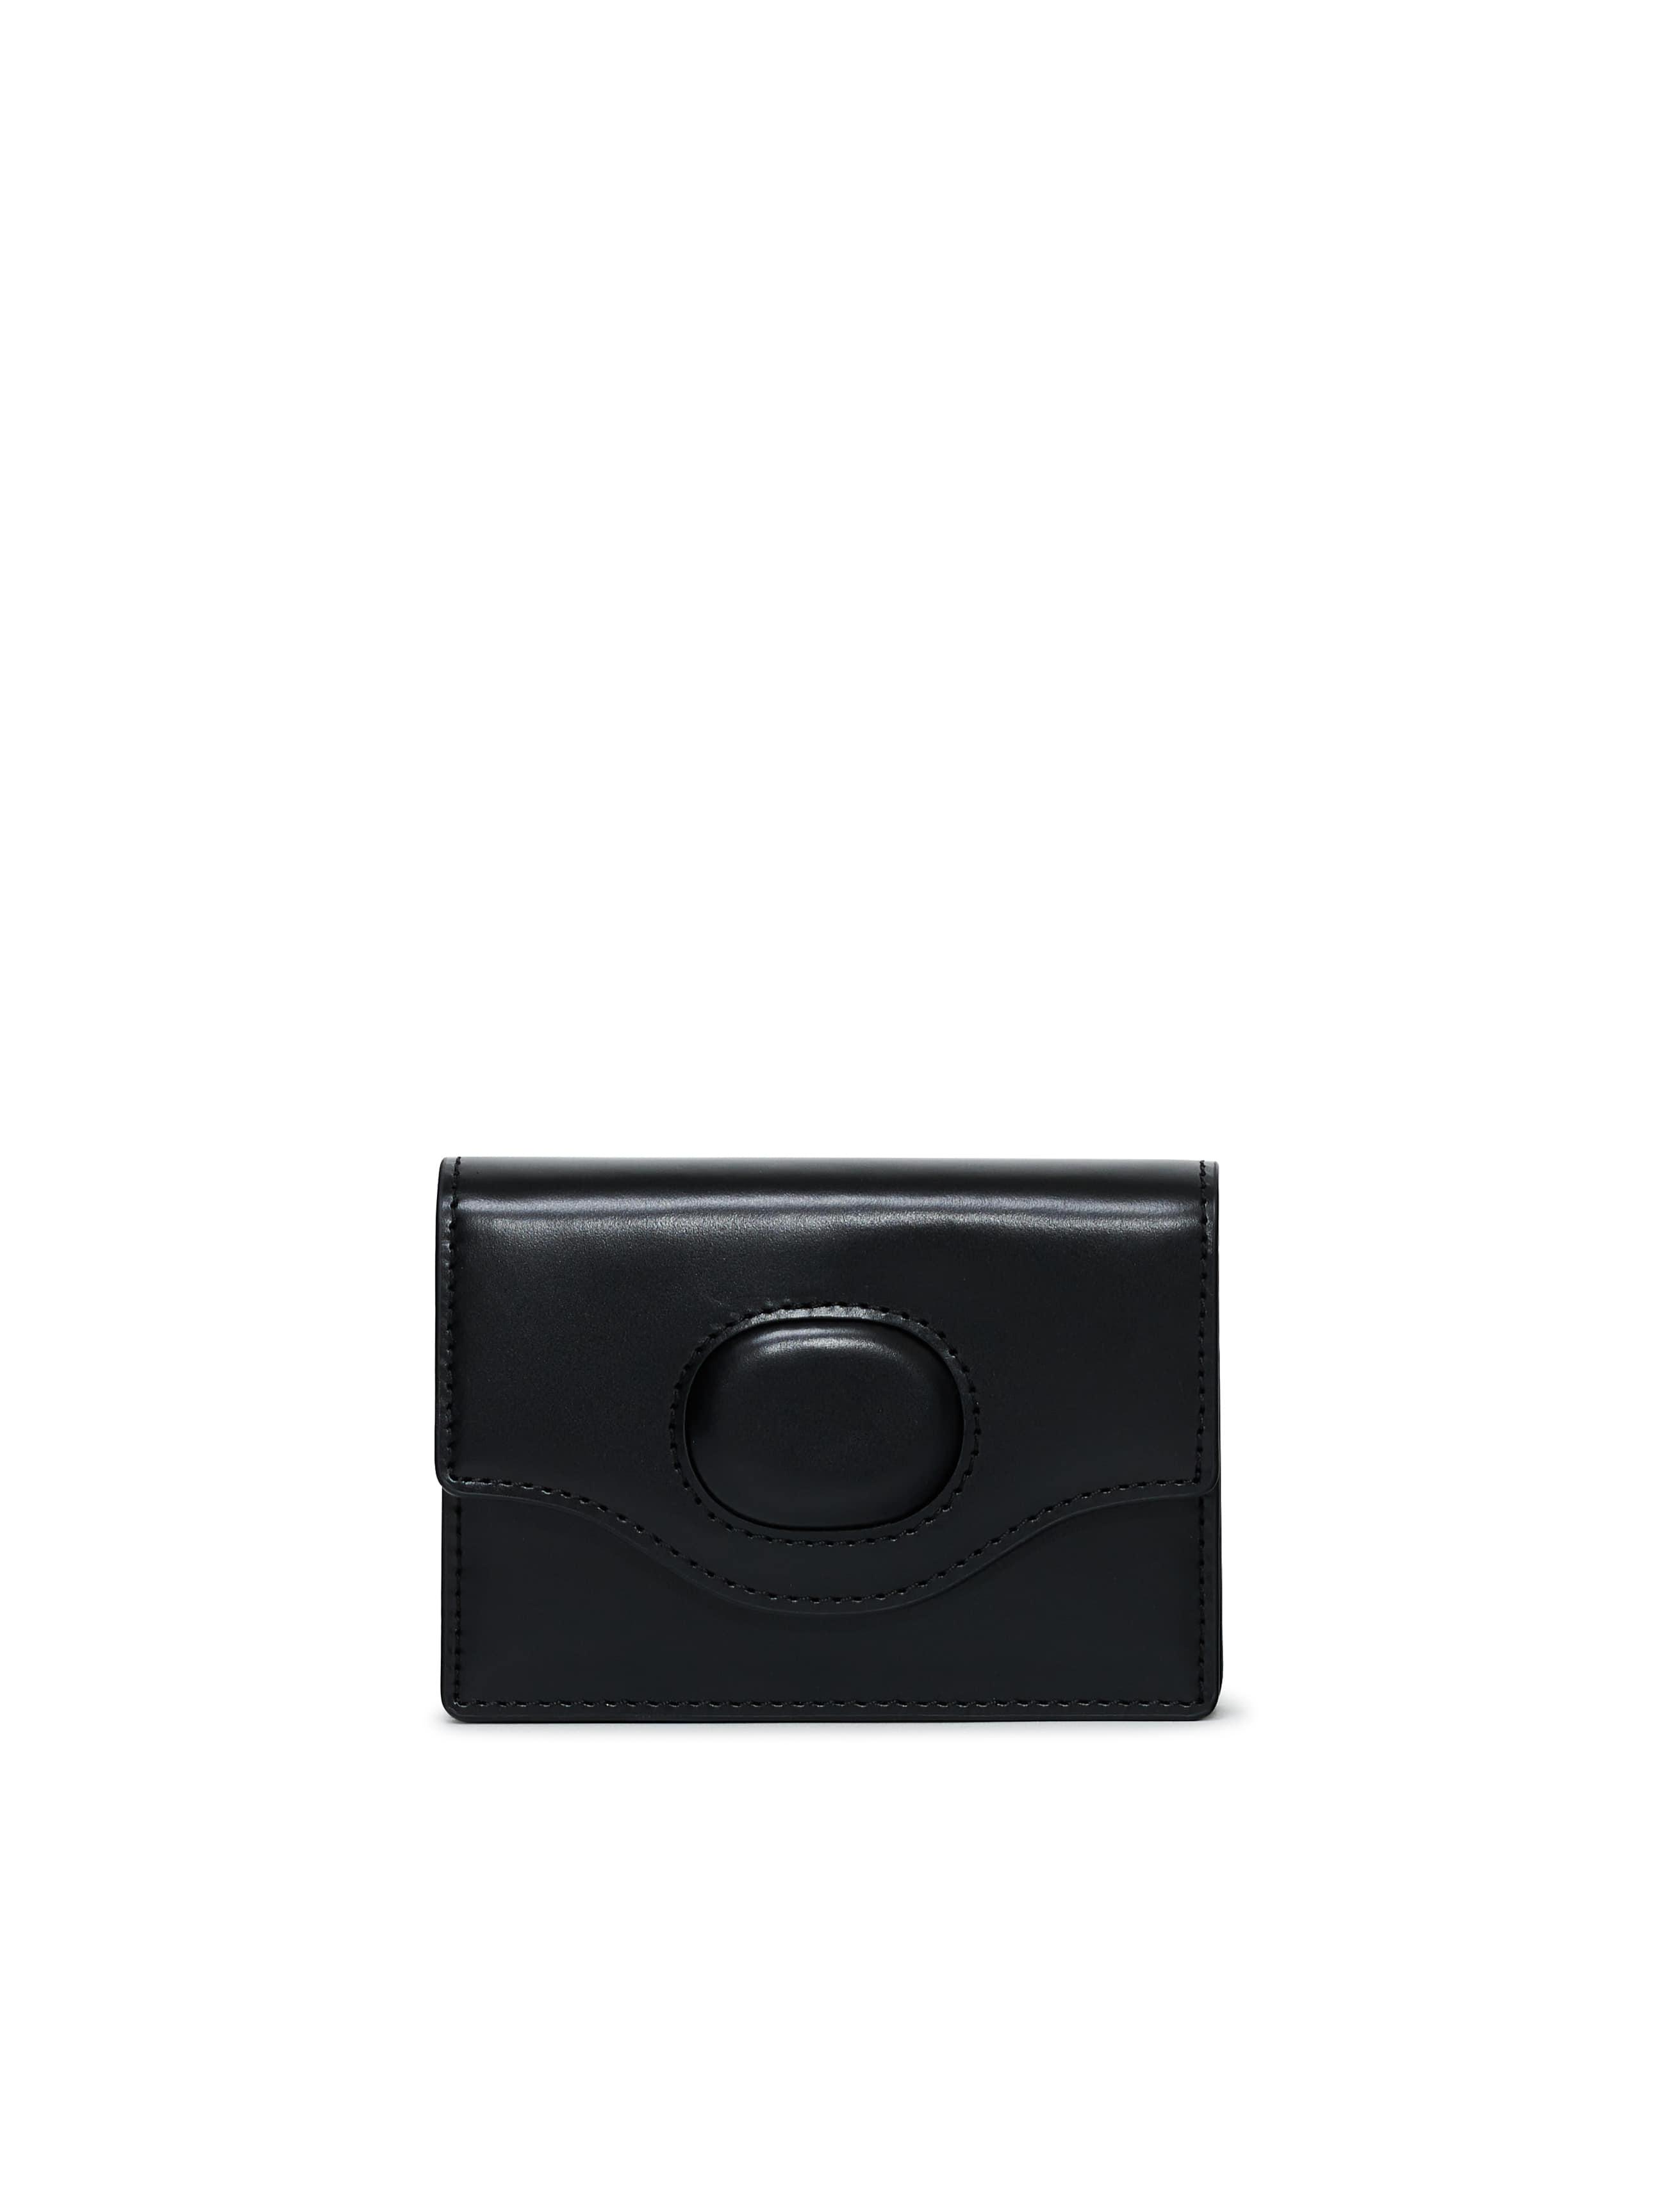 EGGSHELL CARD WALLET_BLACK [재입고 6/14 순차배송]